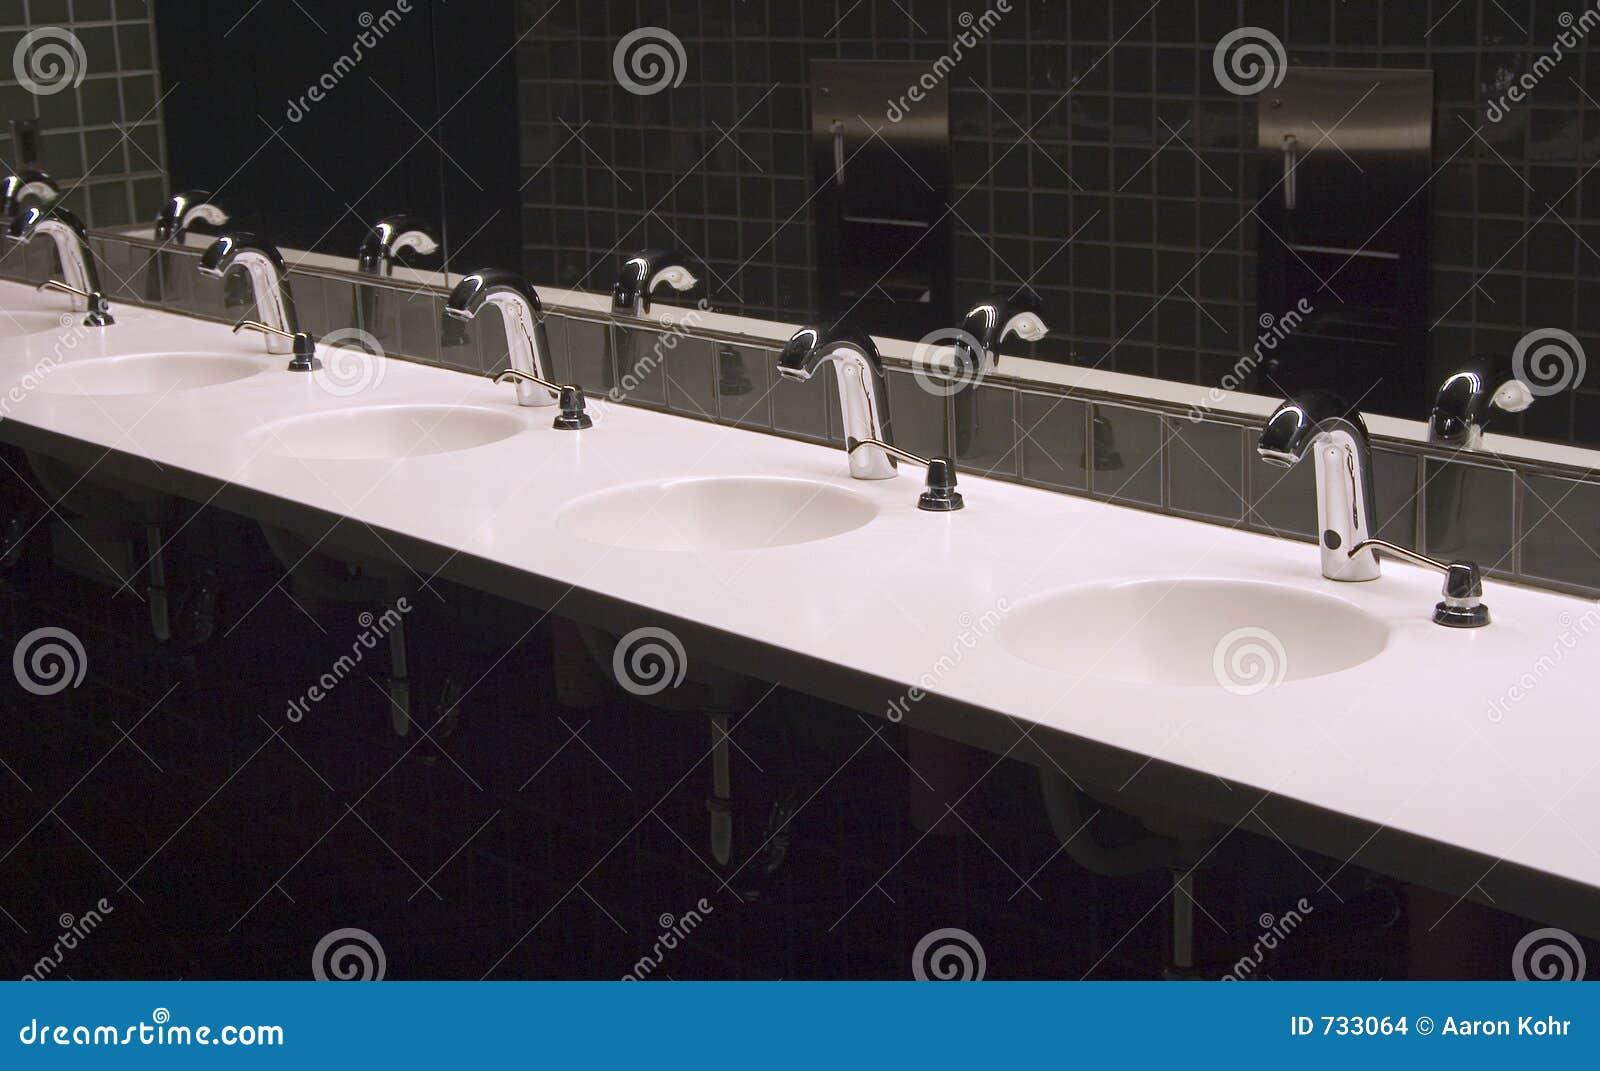 Bathroom Sinks Dallas Part - 19: Bathroom Sinks 3